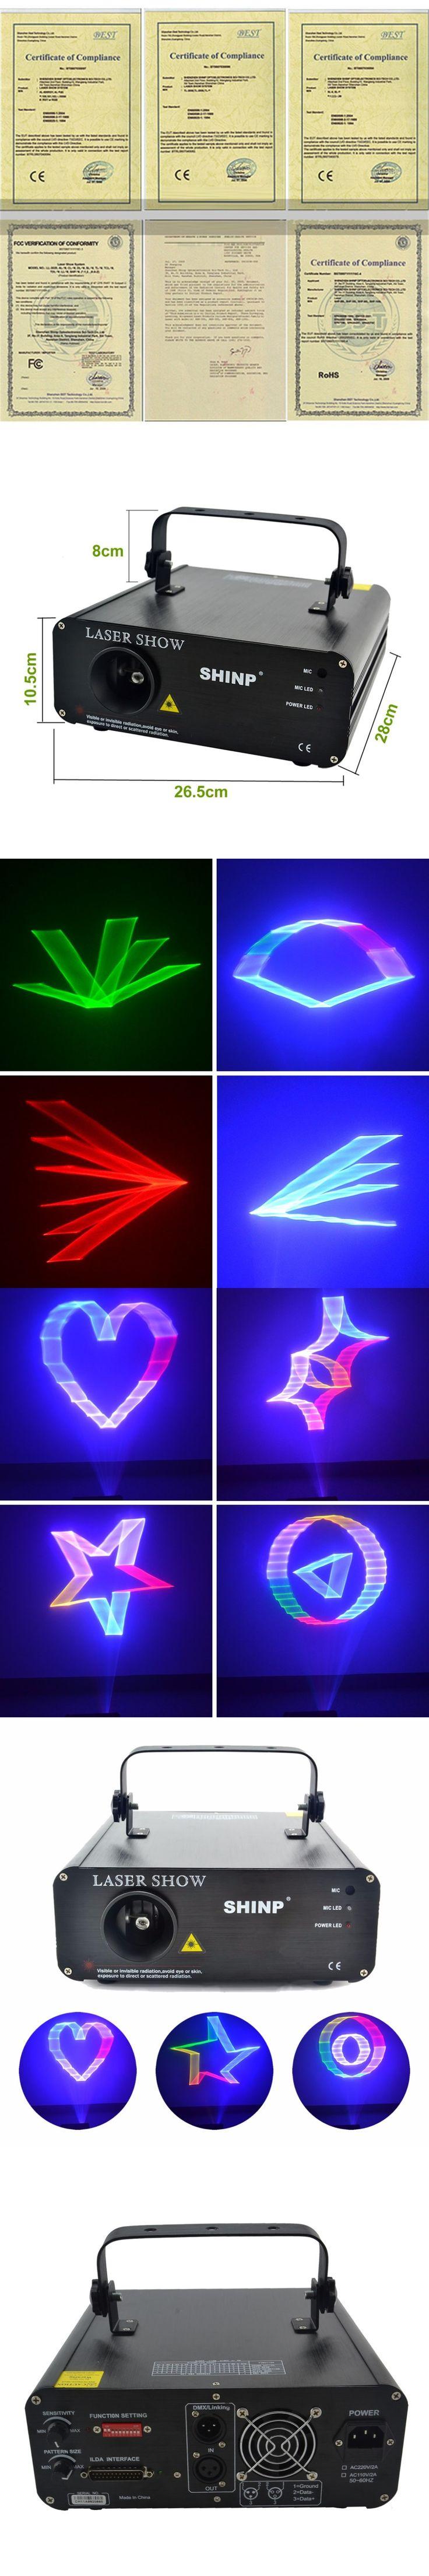 SHINP 3D RGB Animation 12CH DMX 512  Laser Lights Scanner DJ Party KTV Disco Projector Show Stage Lighting AL-460RGB(3D)